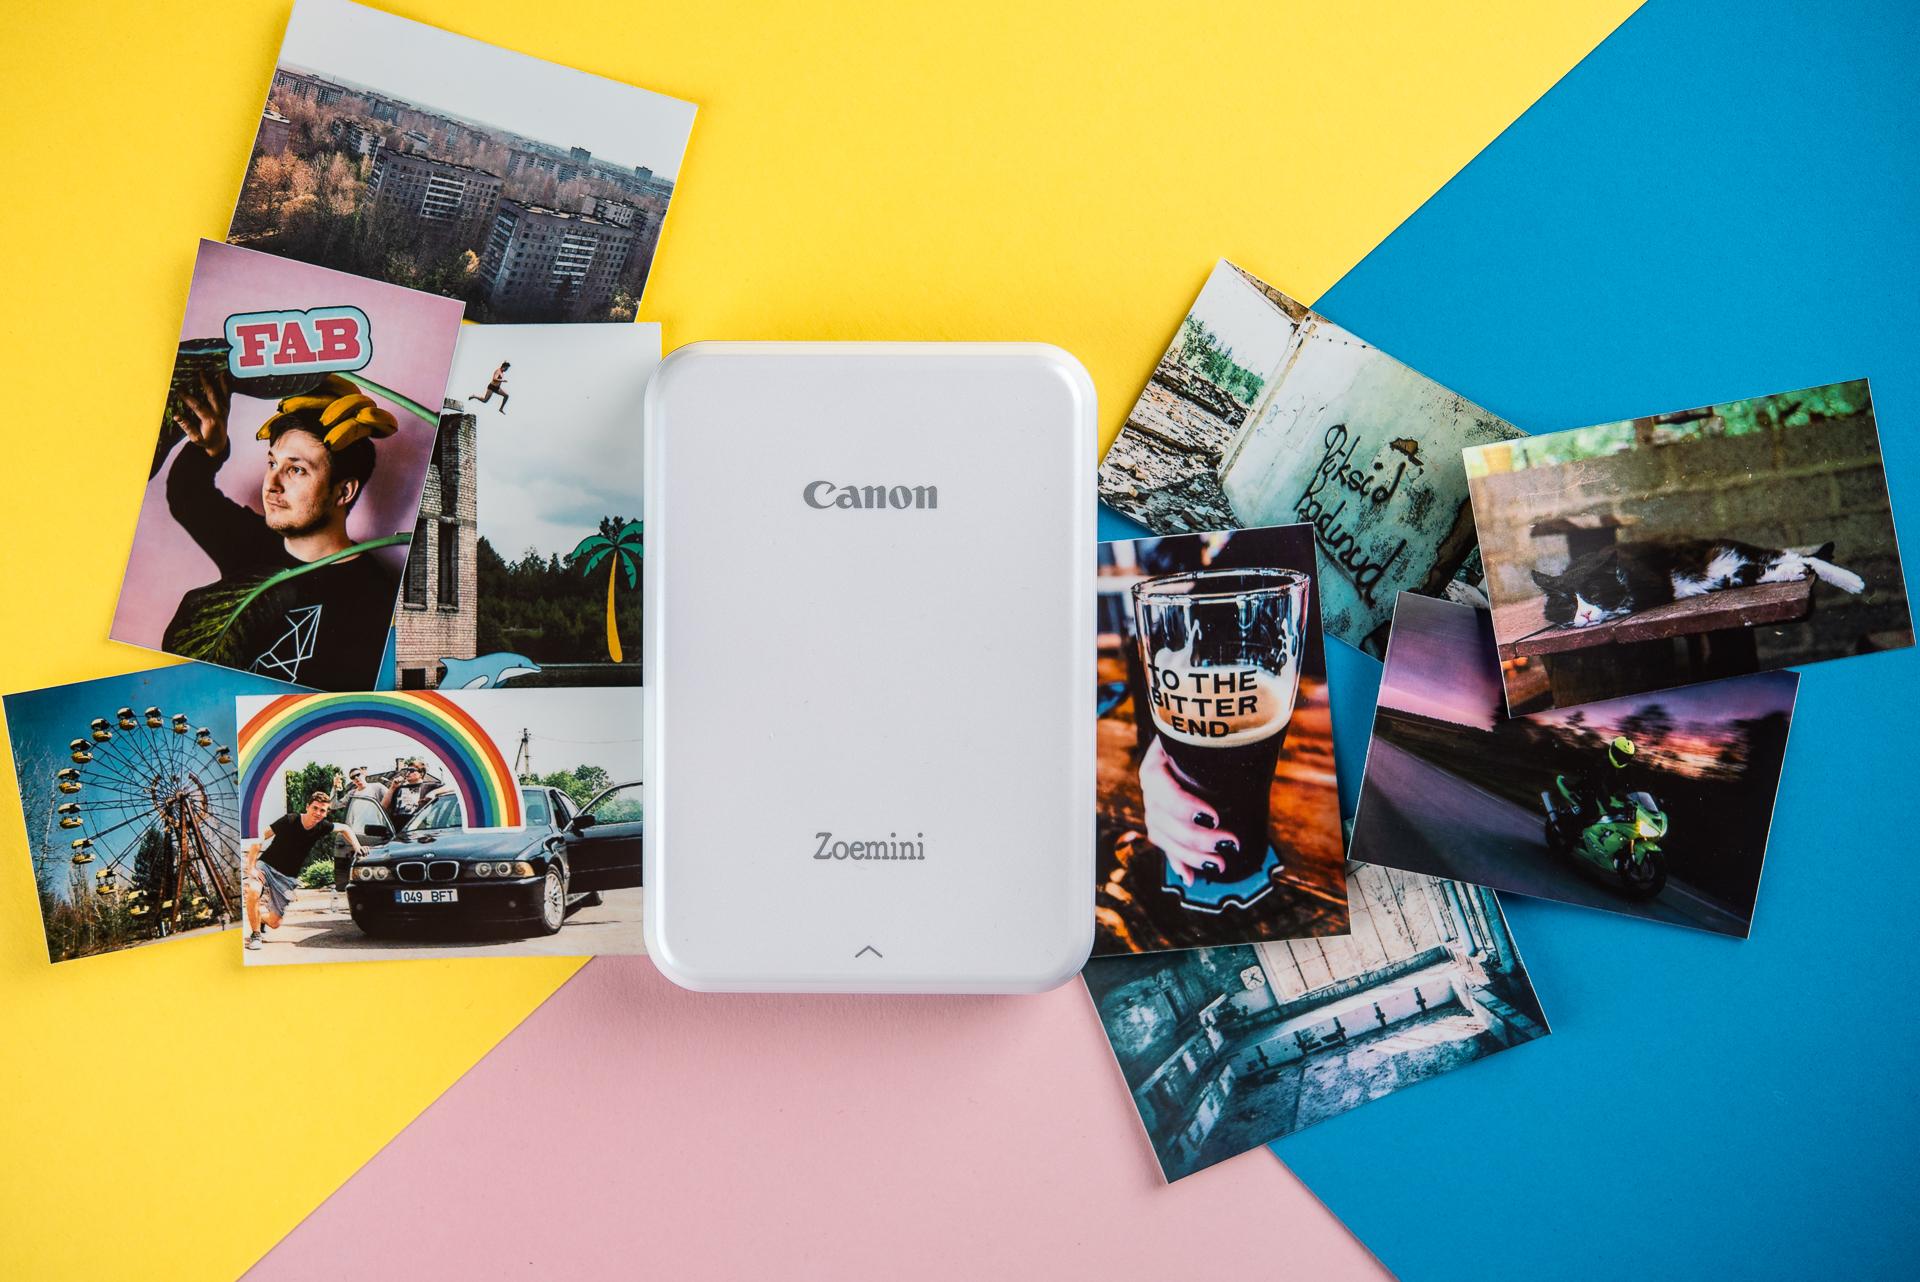 Digitest.ee: Canon Zoemini fotoprinter – Instagram otse rahakoti vahele